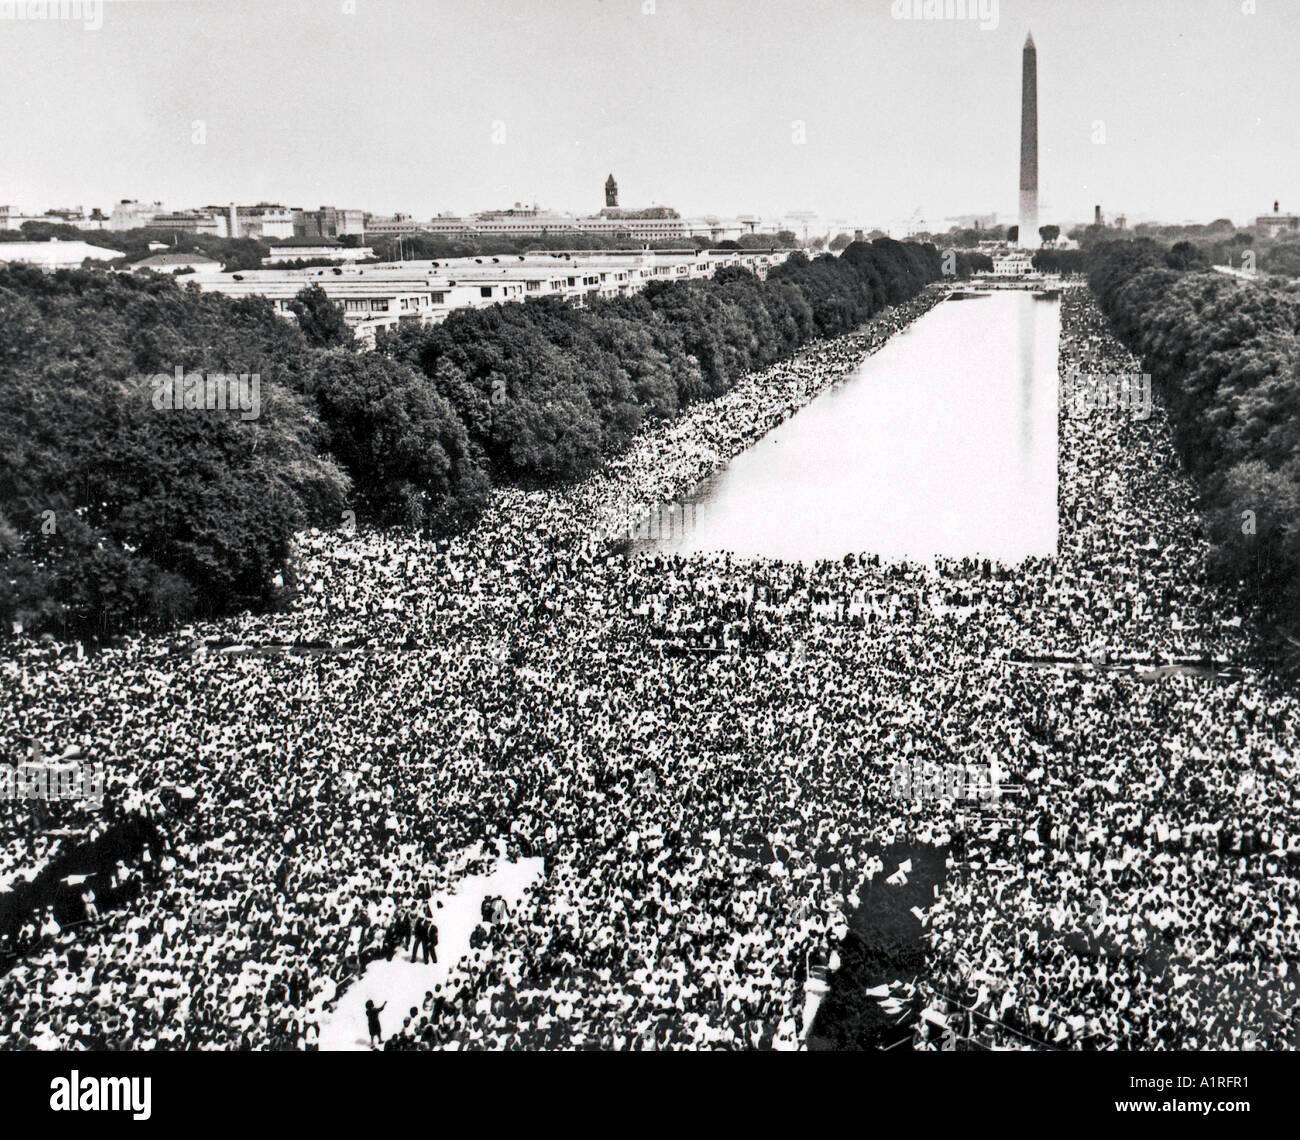 Marche sur Washington, Martin Luther King, I have a Dream speech Banque D'Images